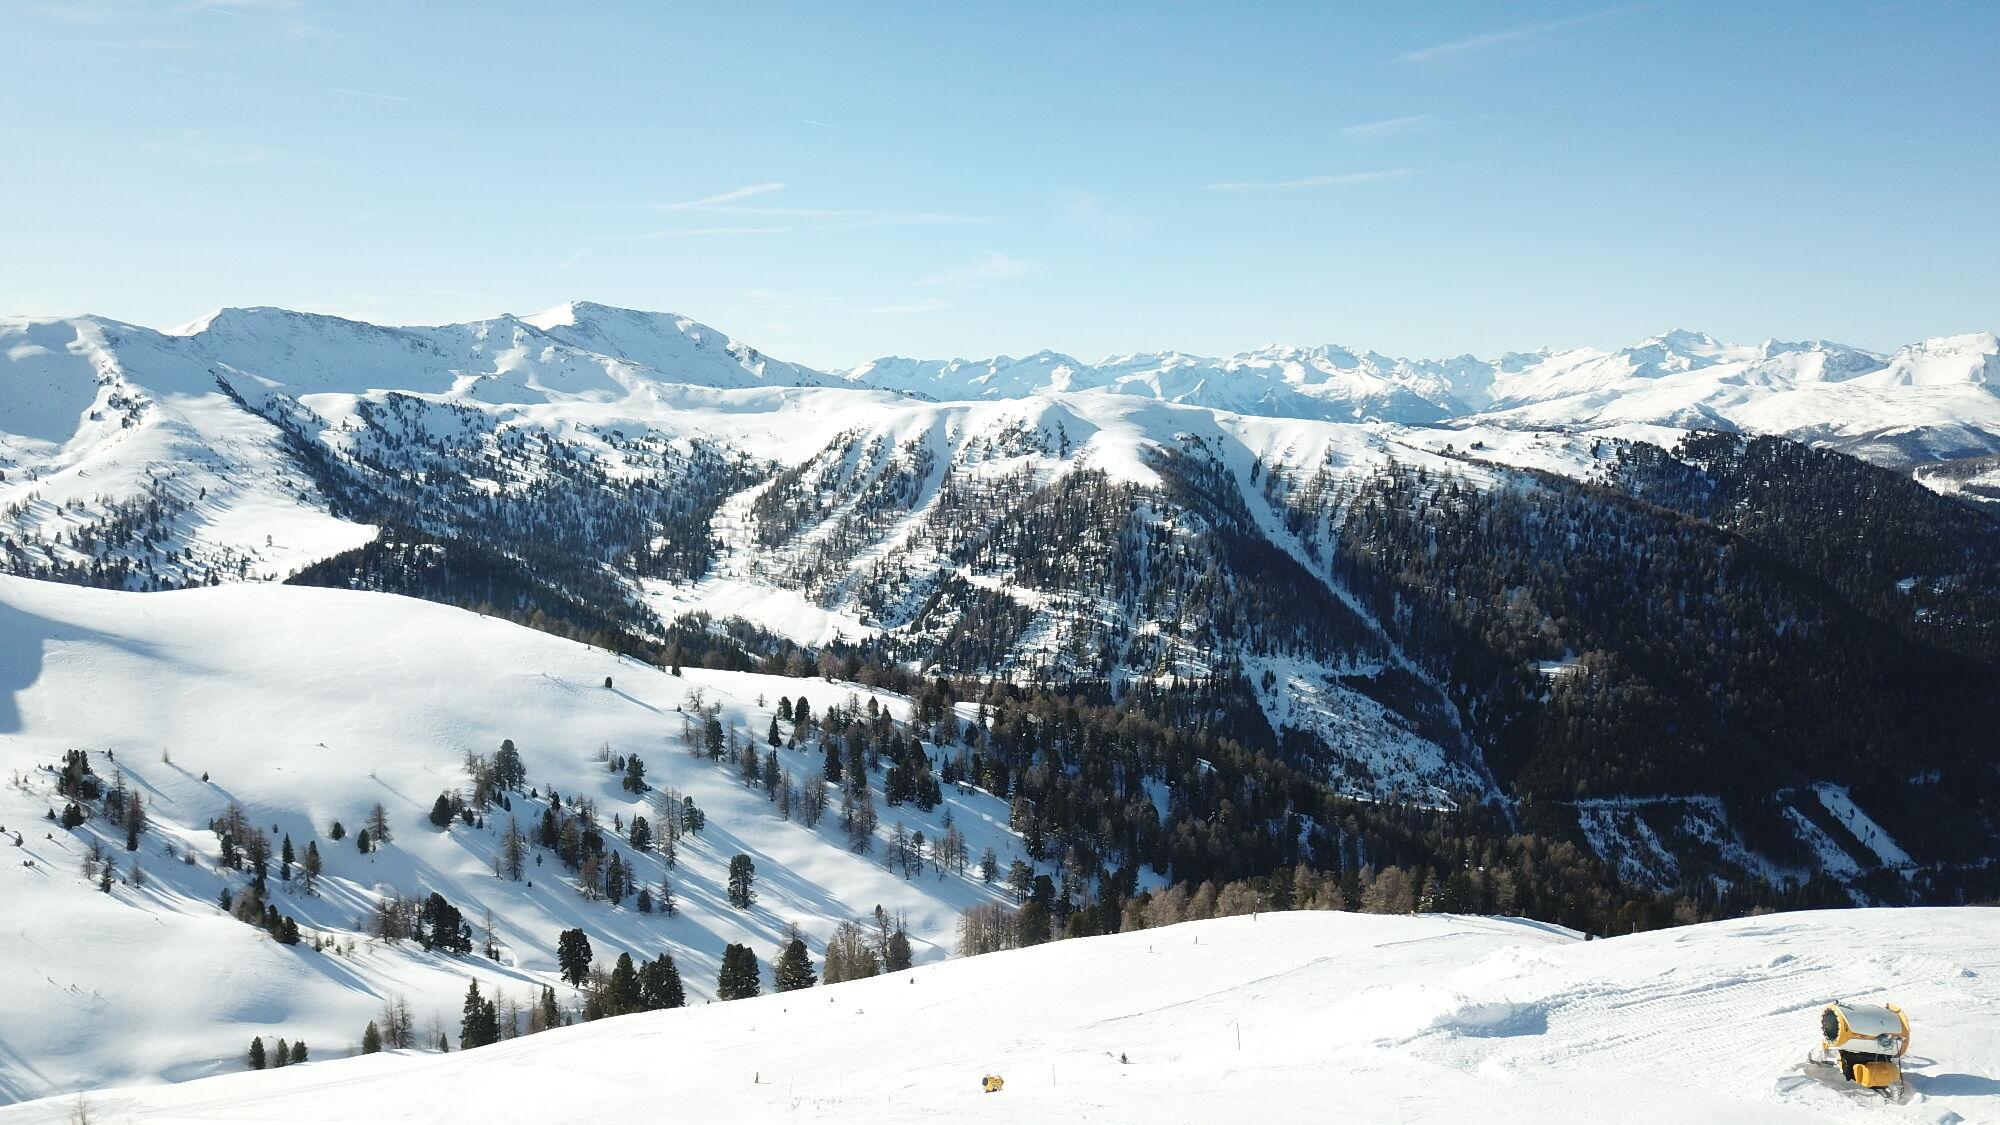 Bergpanorama des Skigebiet Innerkrems